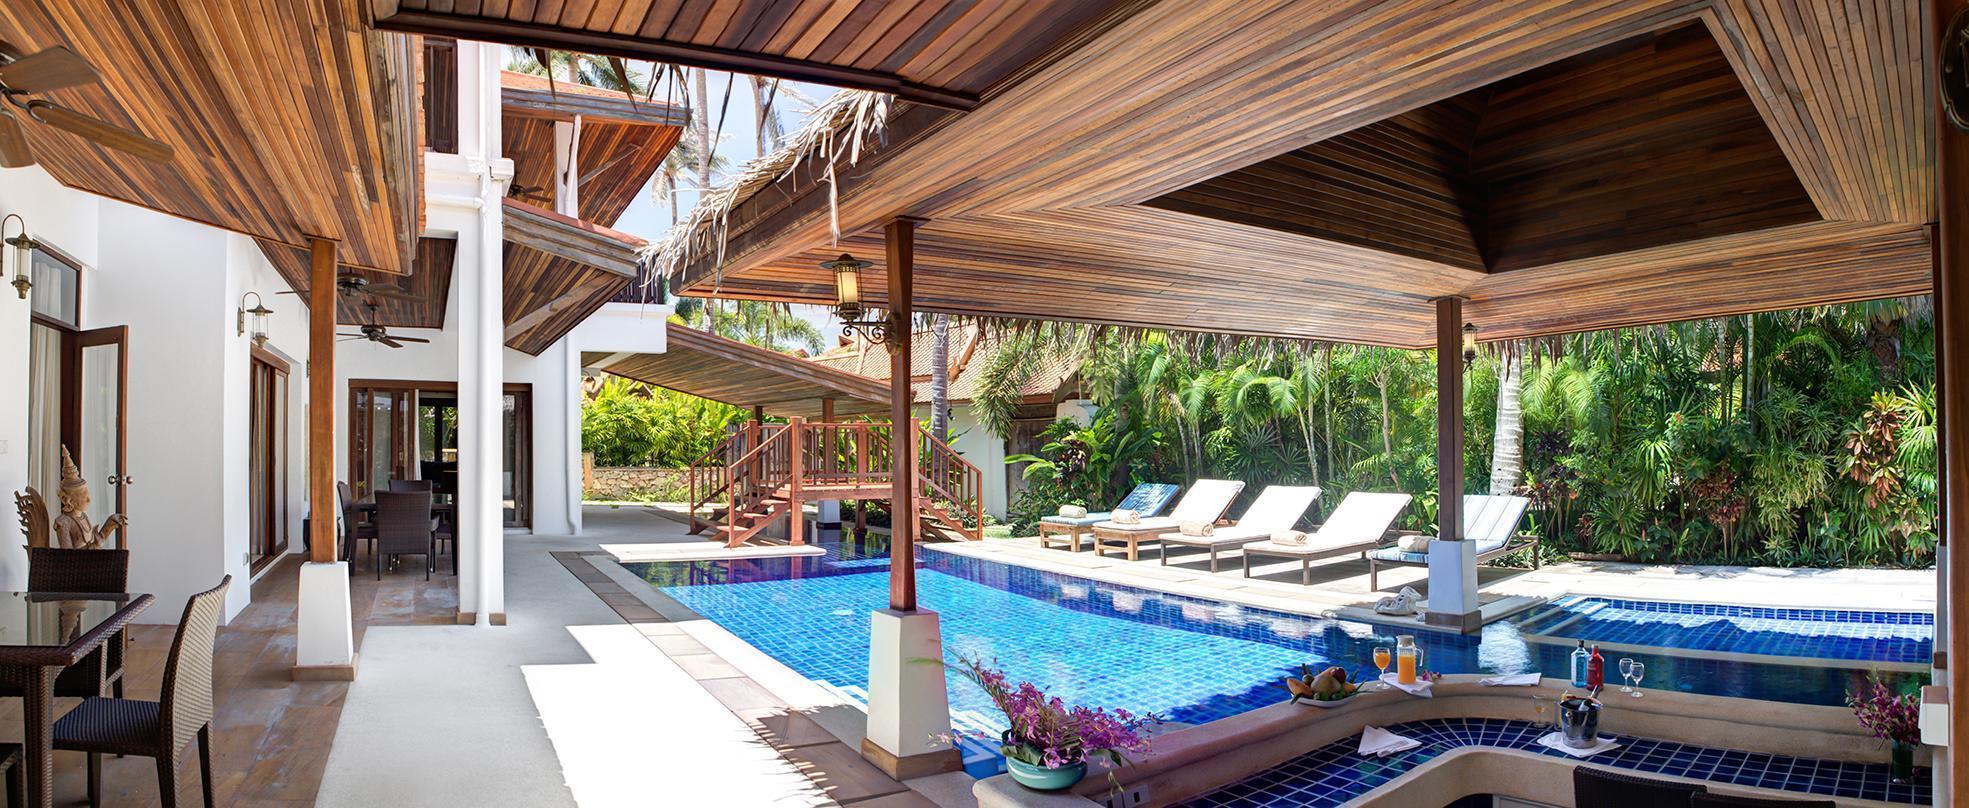 Beachfront Resort Villa Baan Oasis 3BR 3 ห้องนอน 3 ห้องน้ำส่วนตัว ขนาด 371 ตร.ม. – หัวถนน